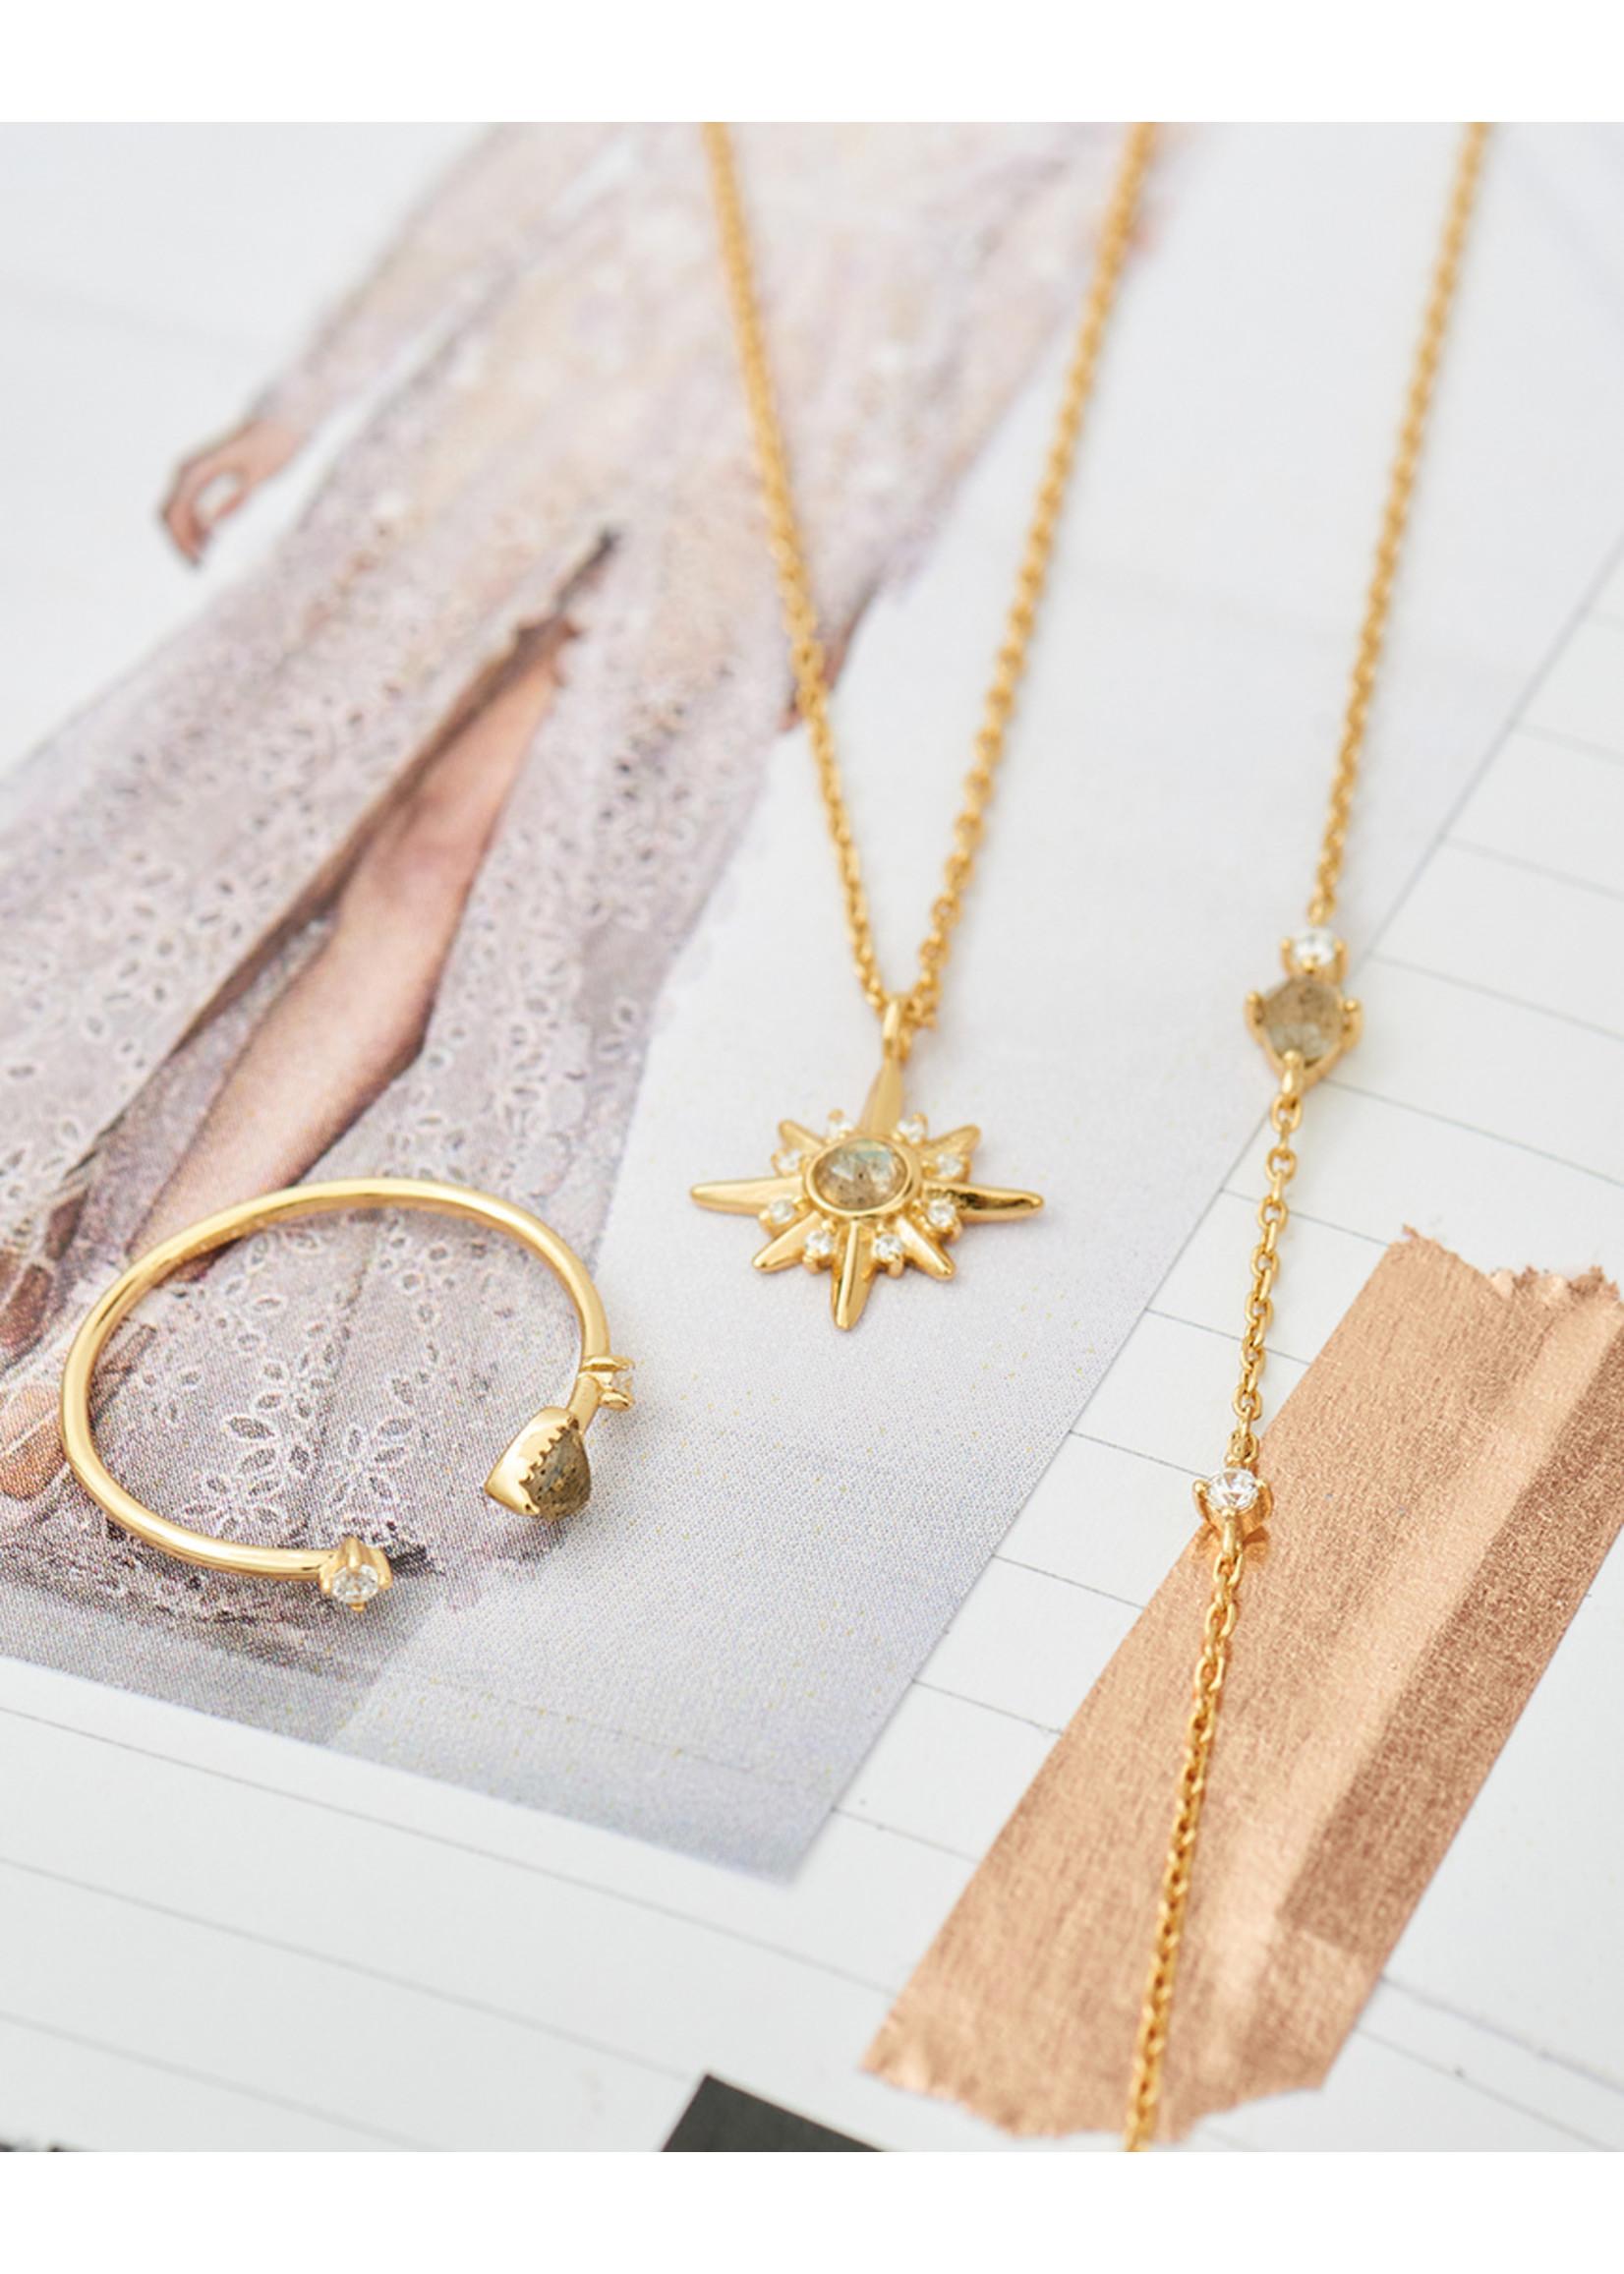 Ania Haie GOLD MIDNIGHT STAR NECKLACE